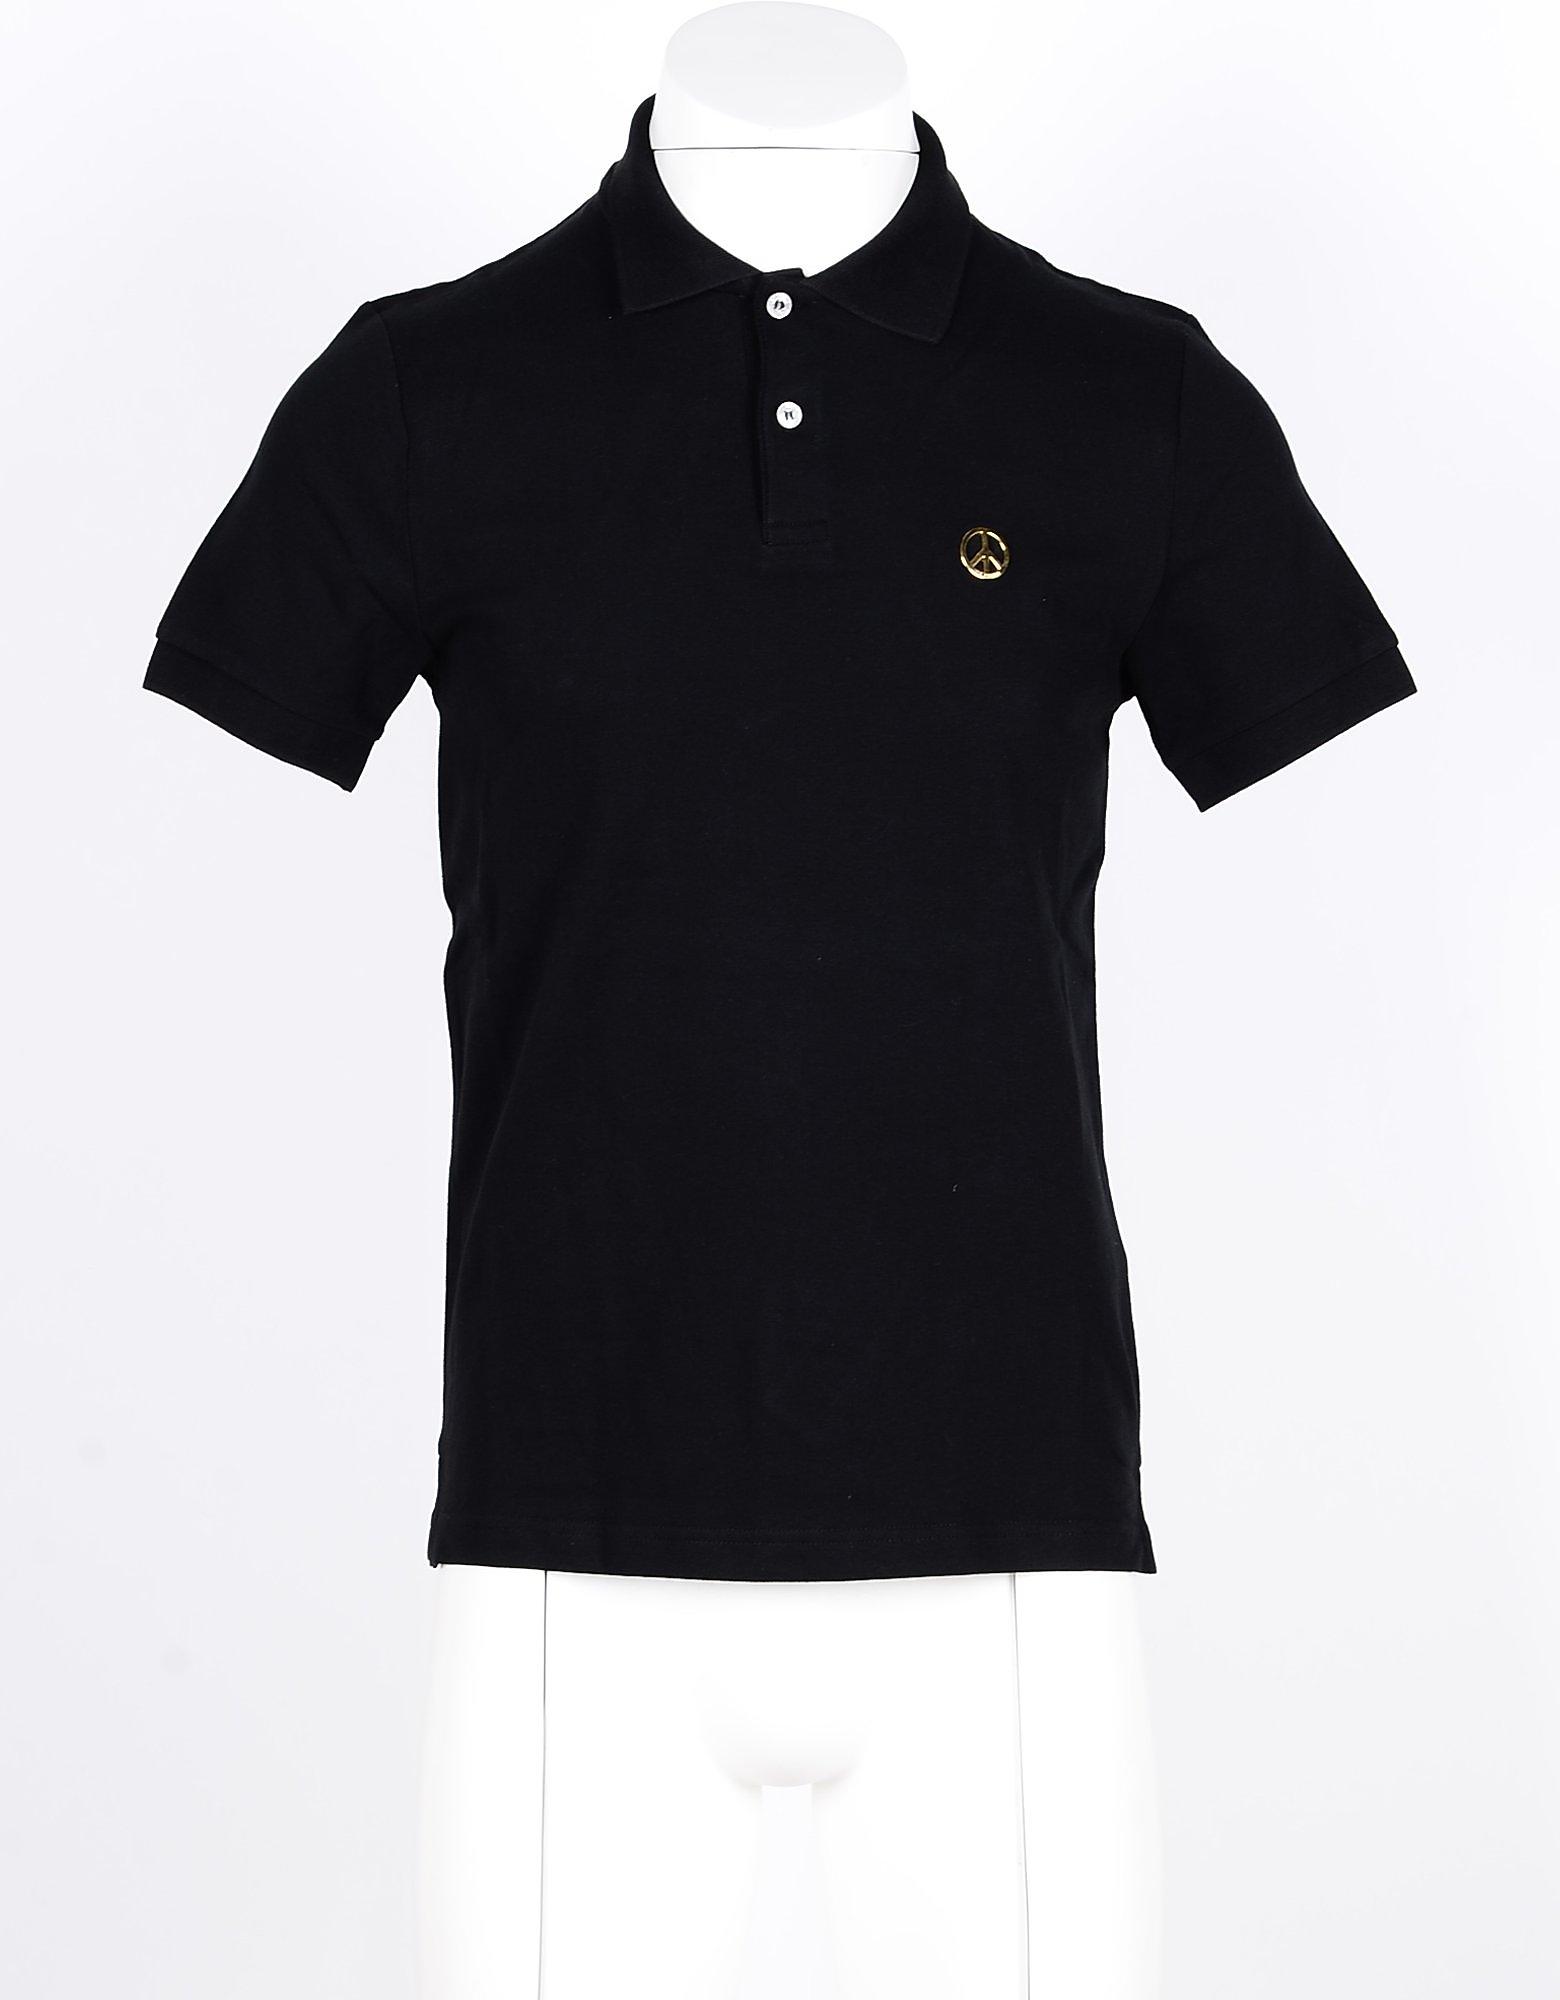 Love Moschino Designer Polo Shirts, Black Cotton Men's Polo Shirt'